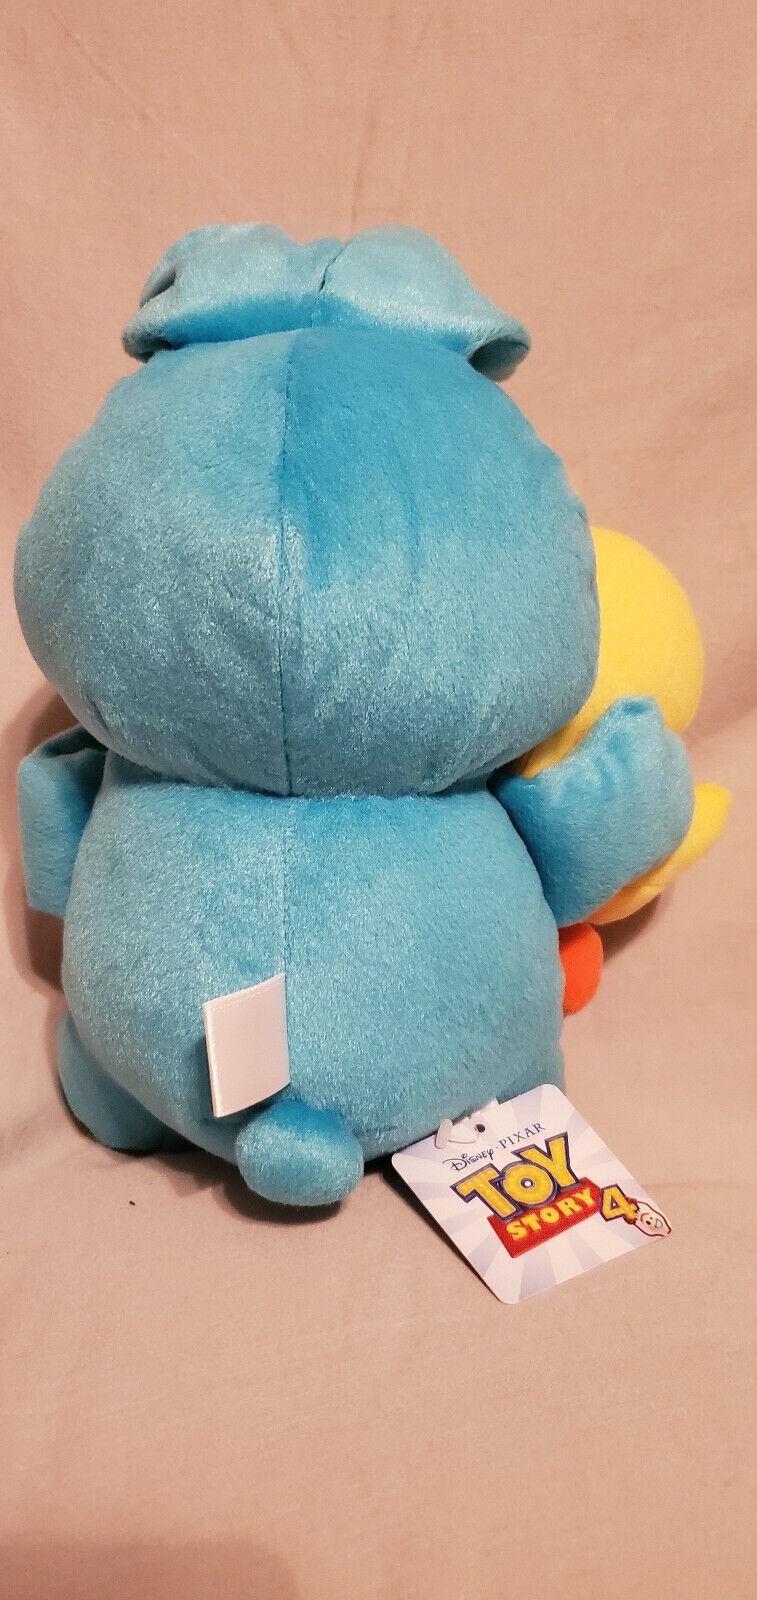 SEGA Toy Story premium stuffed Soft plush backpack 35cm alien Disney kawaii cute